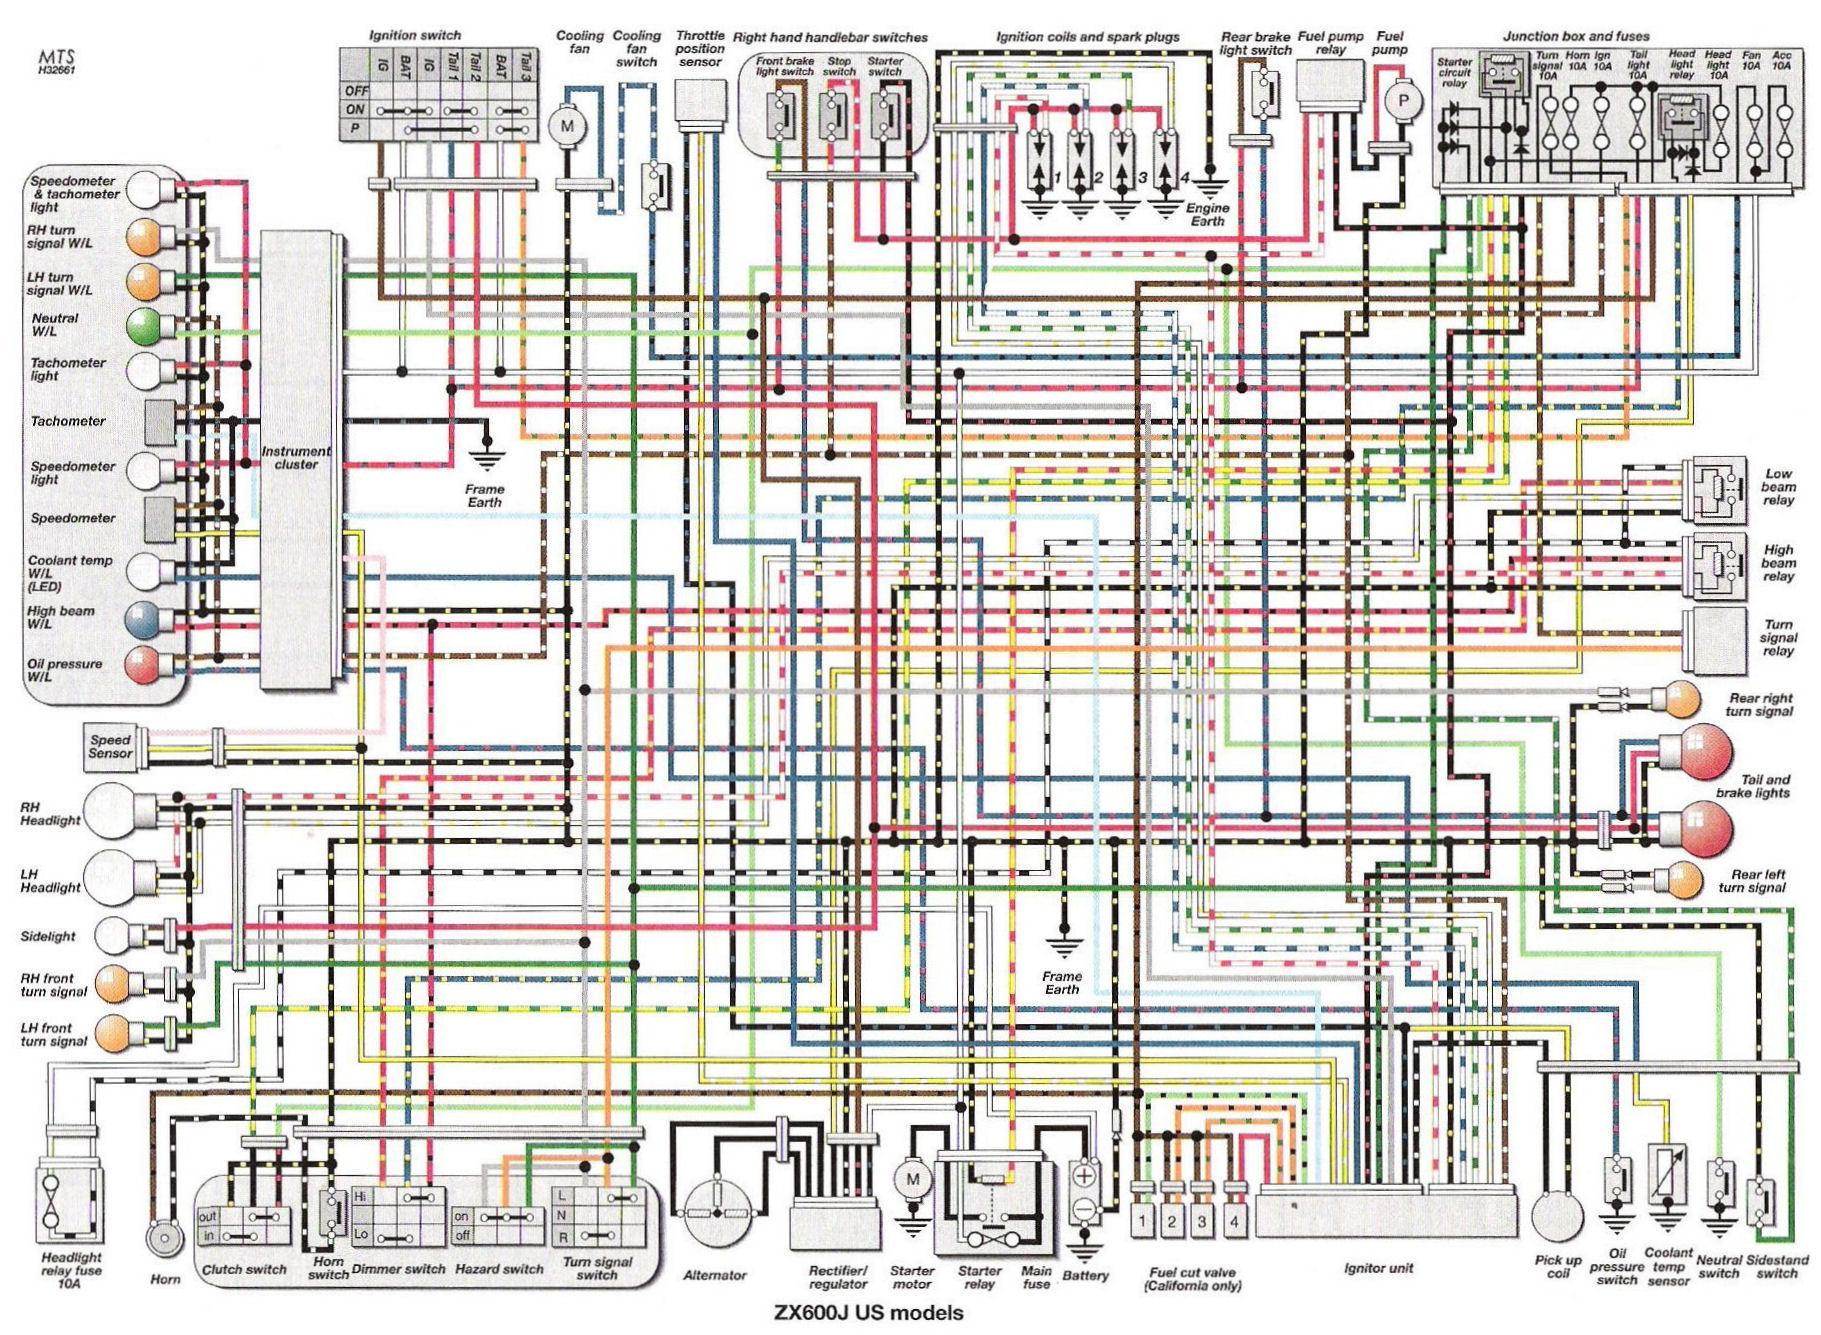 zx600j_us?zoom\=2.625\&resize\=665%2C488 2004 gsxr 600 wiring diagram 2003 gsxr 600 wiring diagram \u2022 wiring 2004 r6 wiring diagram at eliteediting.co